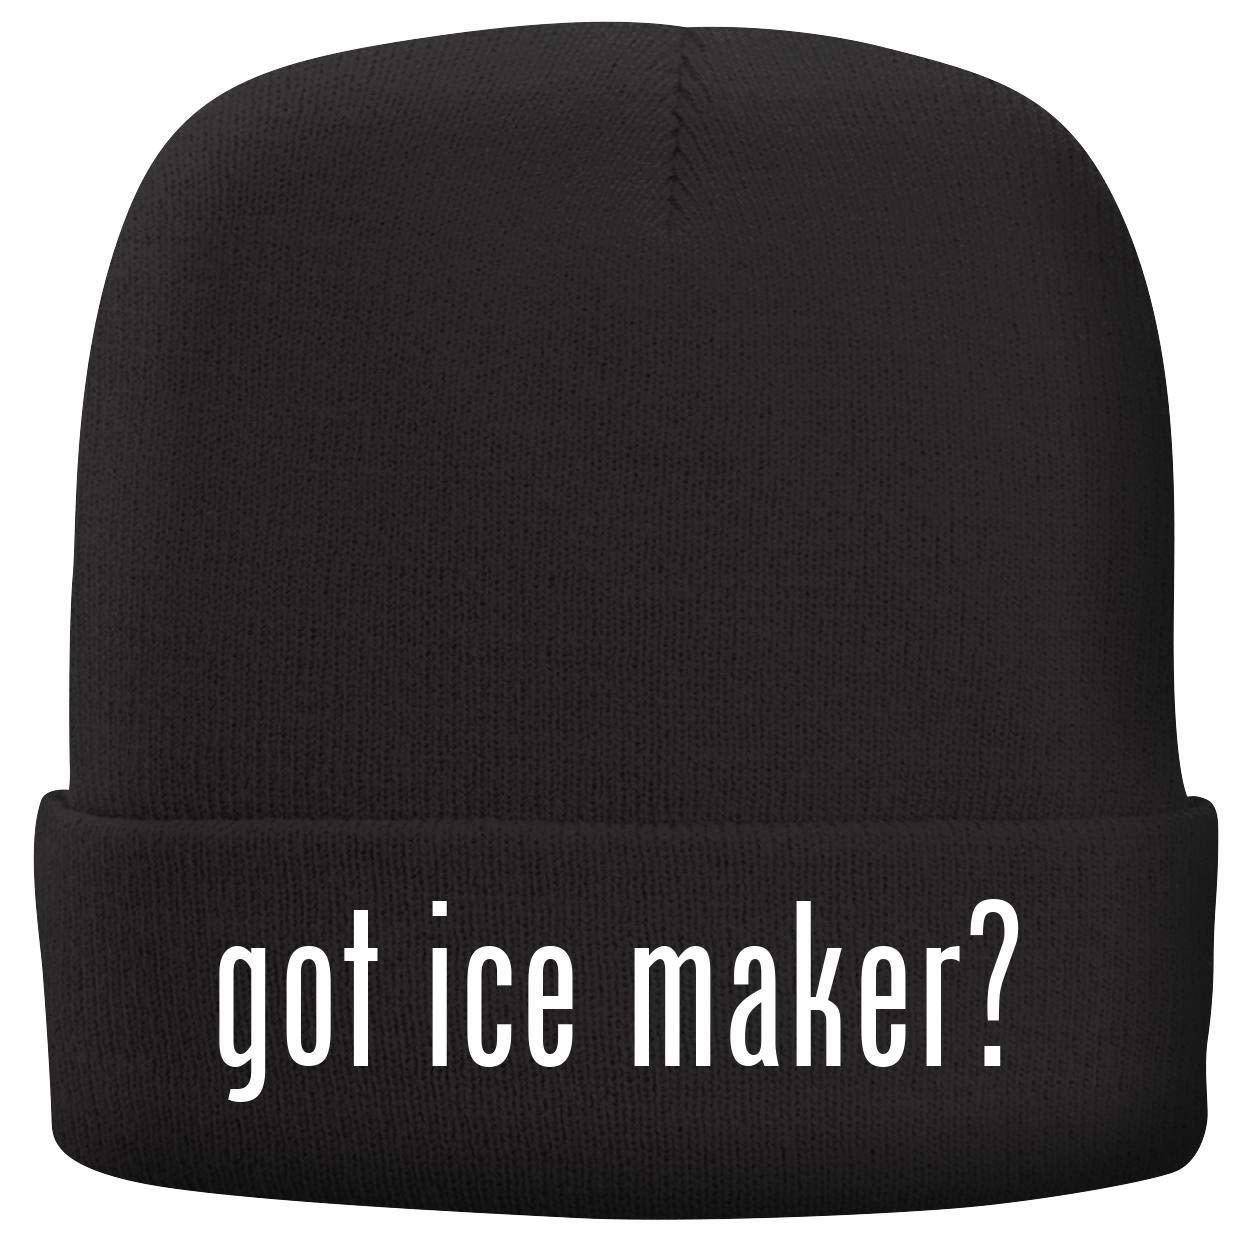 got ice Maker? - Adult Comfortable Fleece Lined Beanie